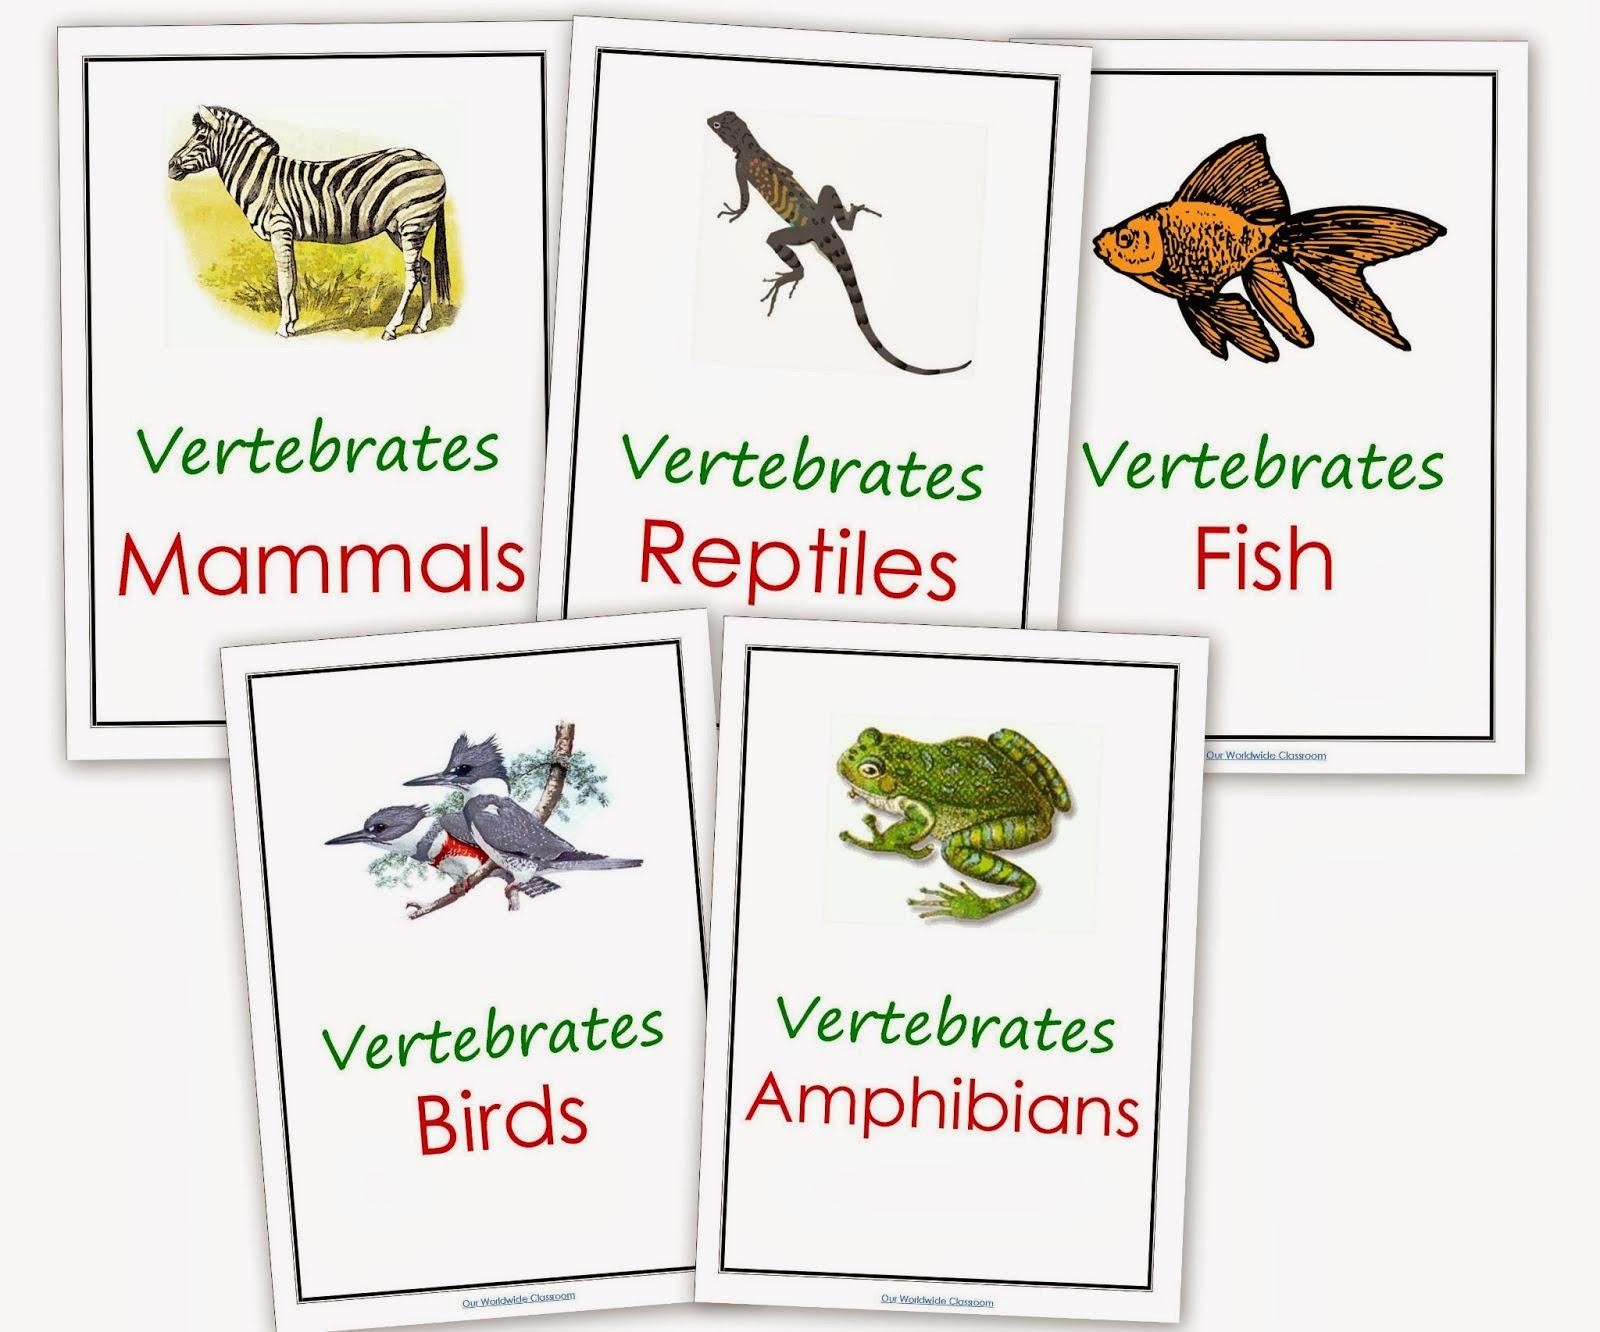 Ceip San Jose De Calasanz Vertebrates And Invertebrates